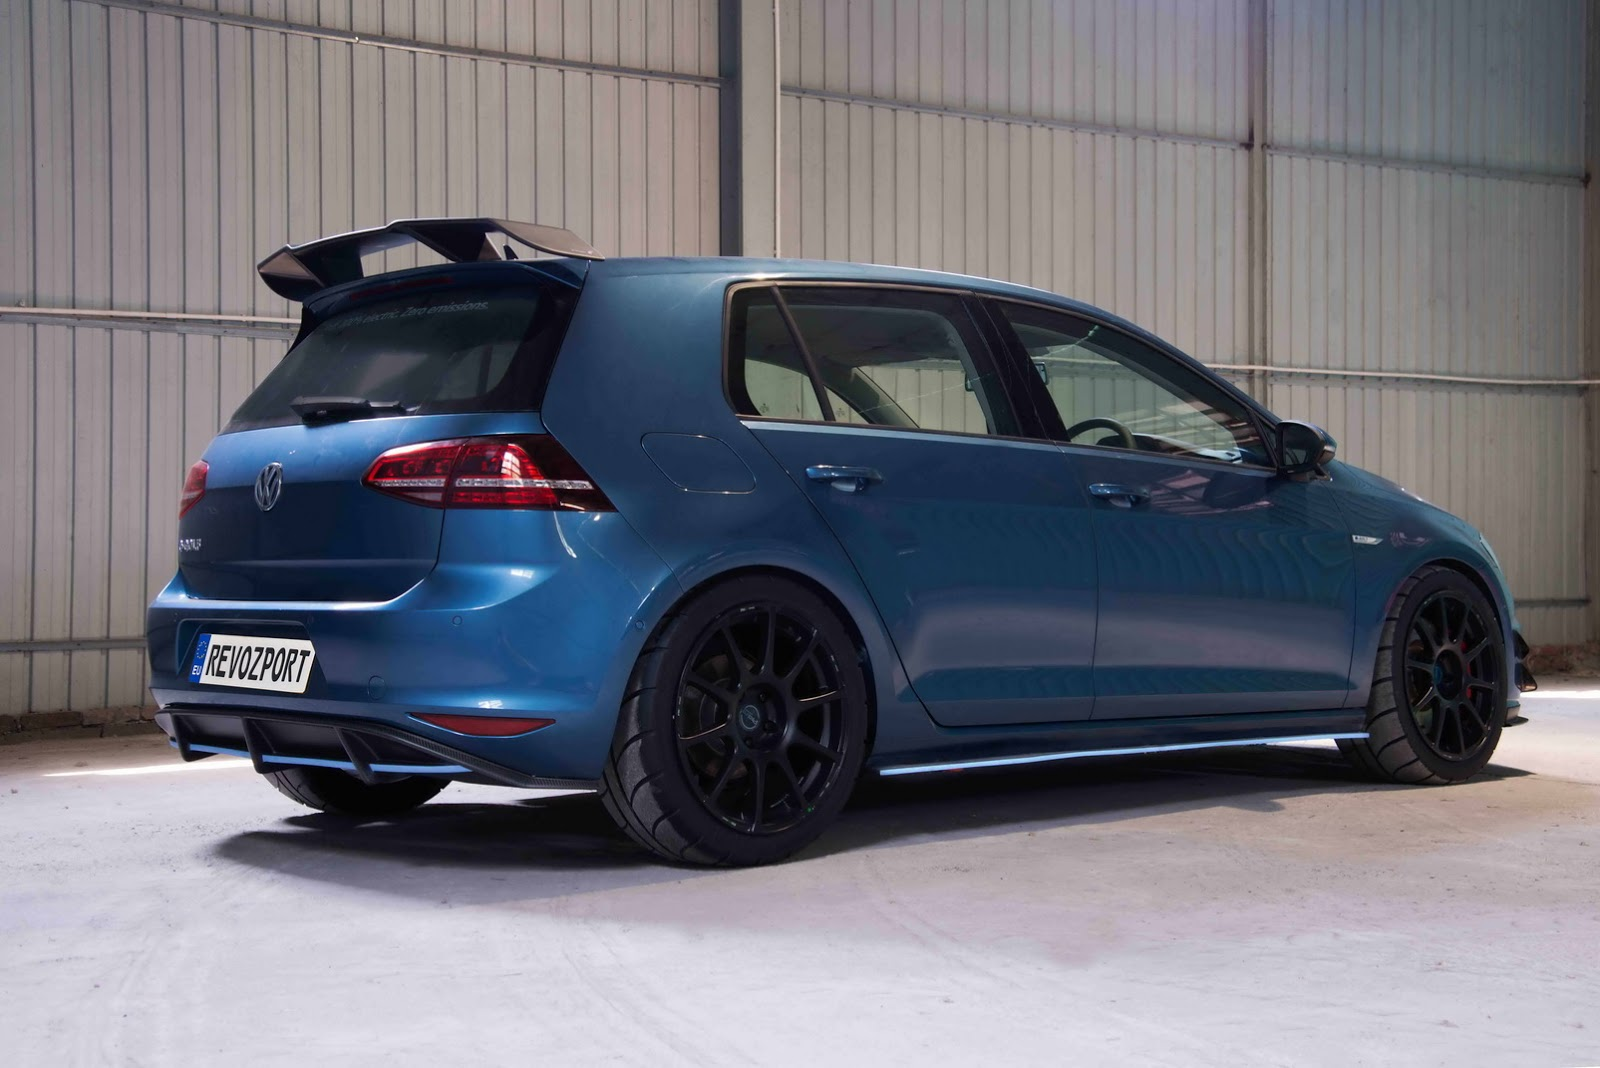 Volkswagen_e-Golf_Razor_7E_by_RevoZport_20